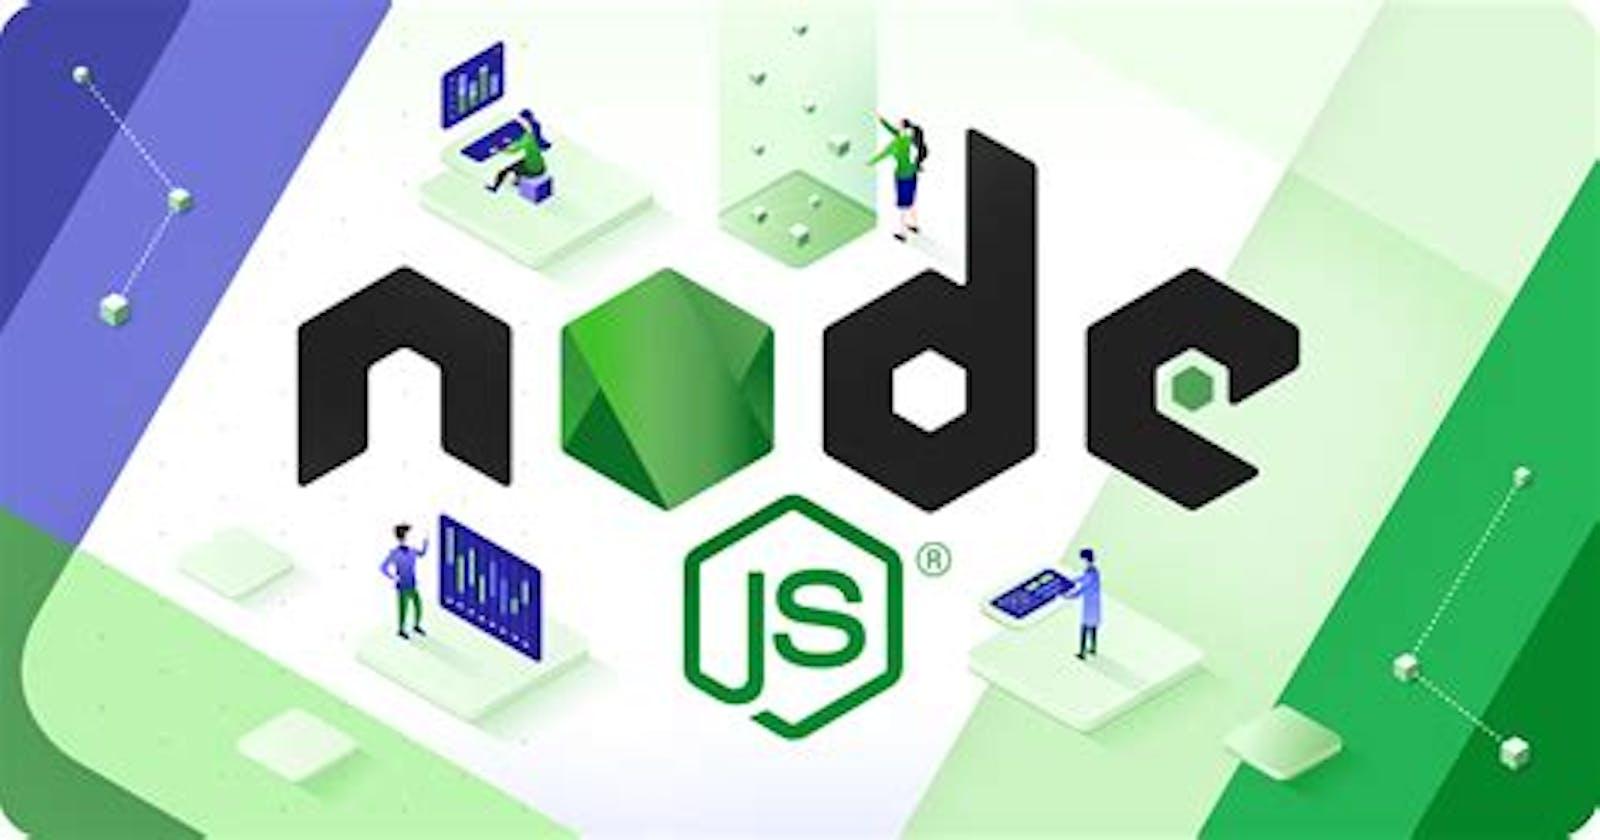 Introduction to node.js